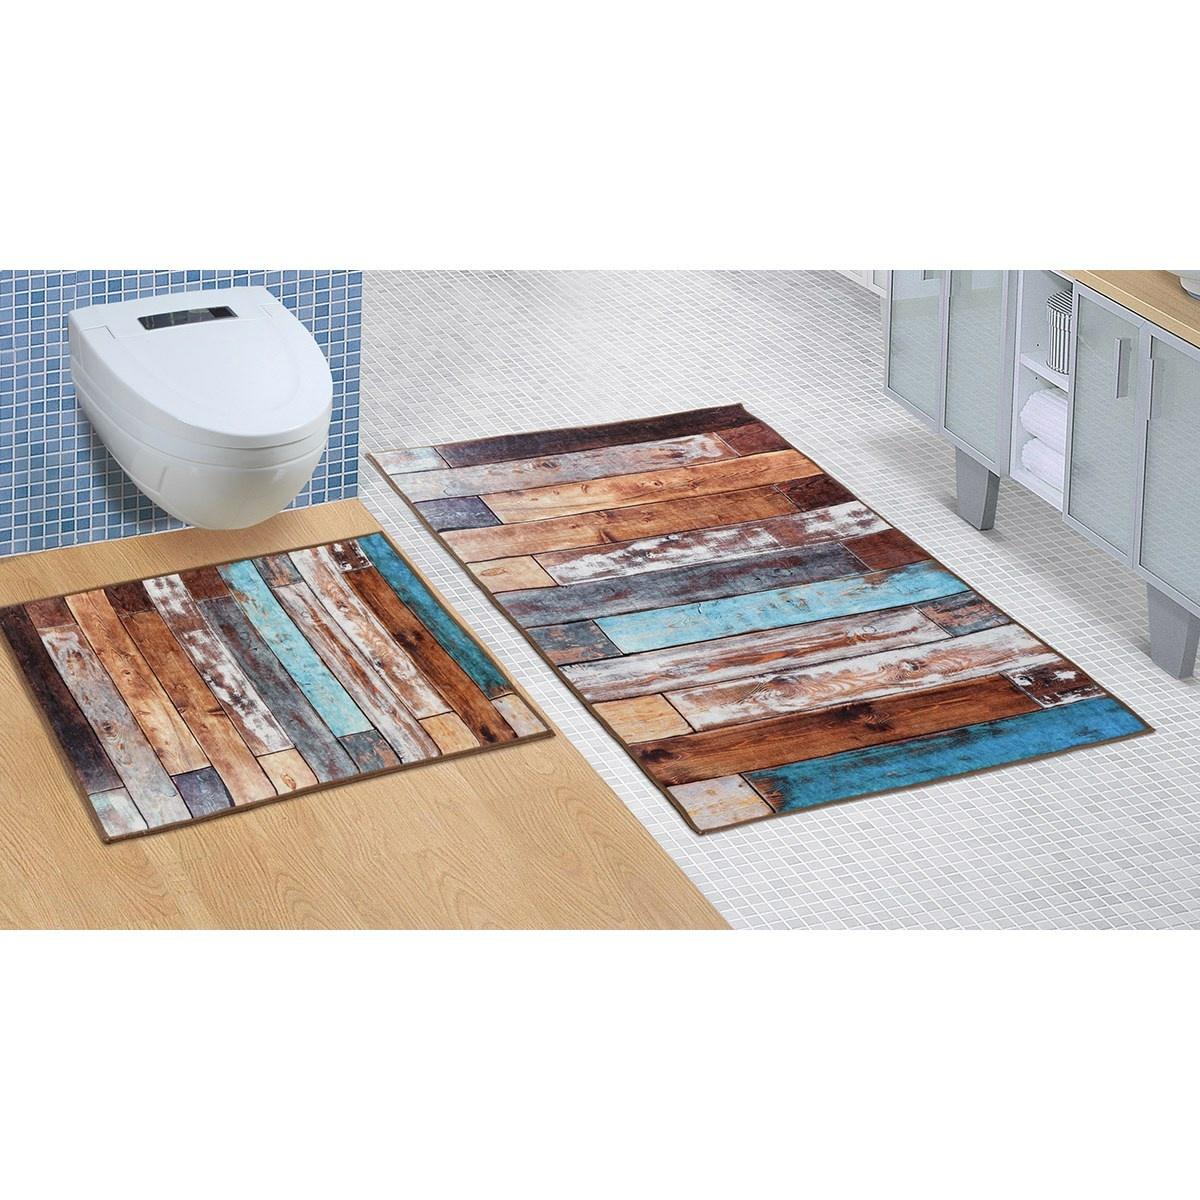 Poza Set covorase de baie Podea de lemn, 60 x 100 cm, 60 x 50 cm